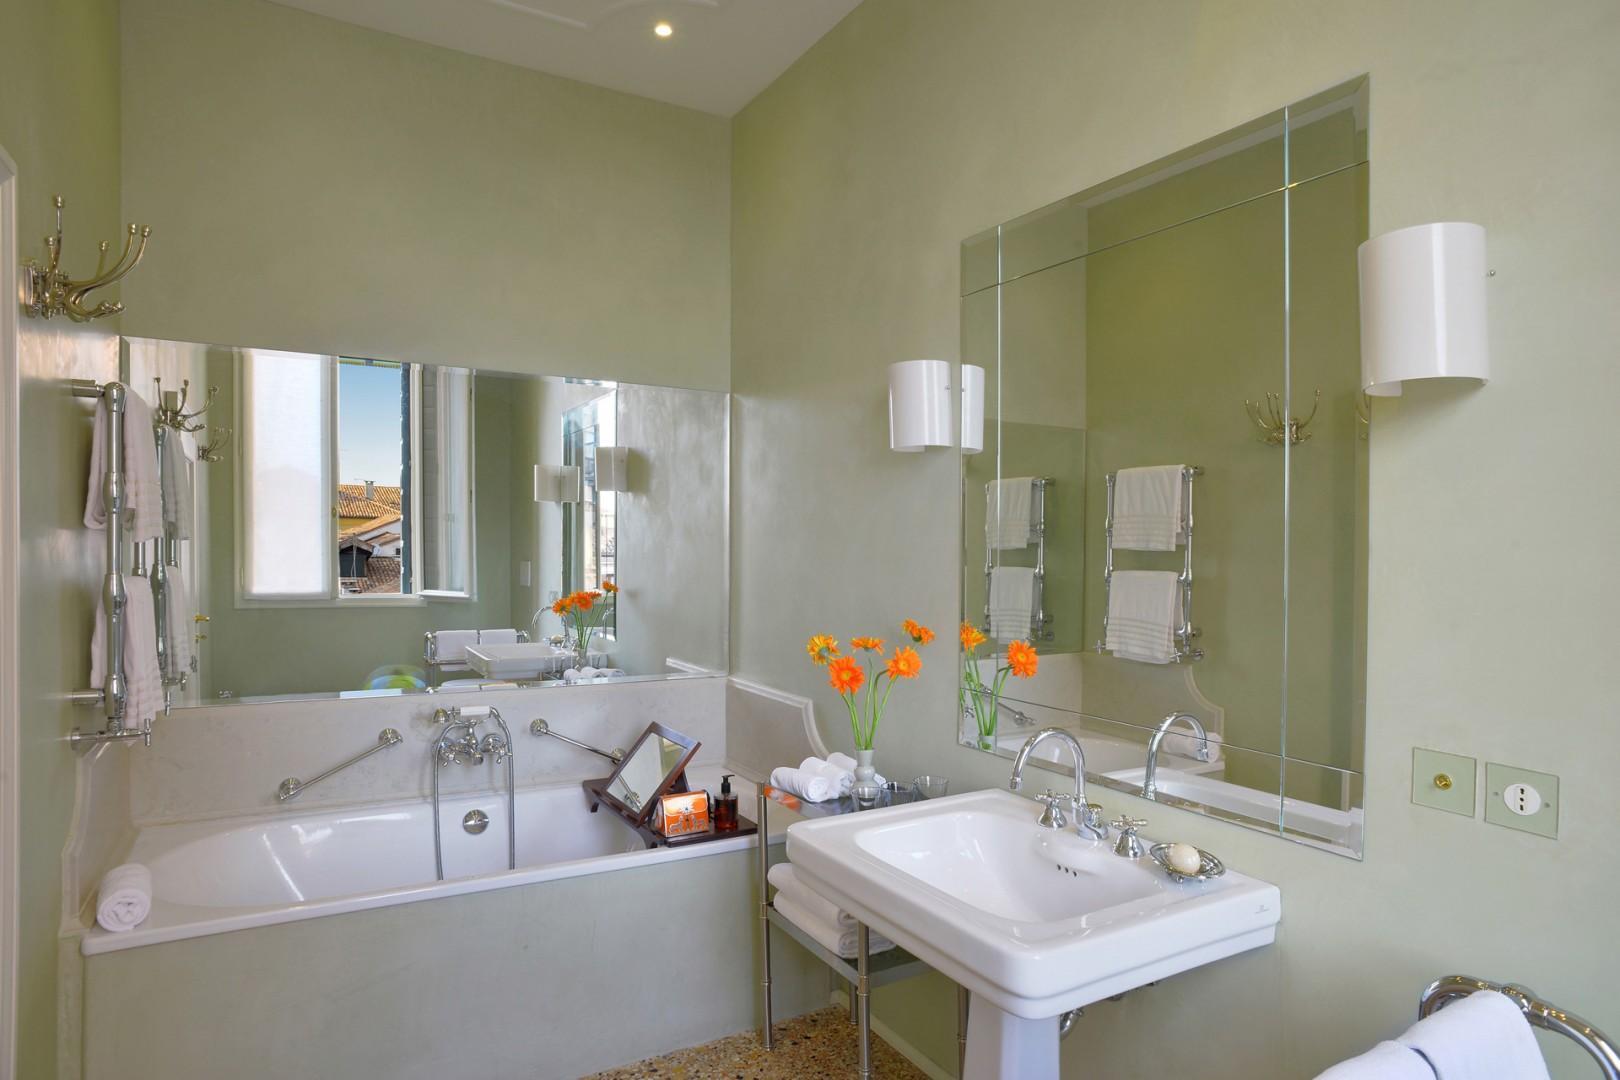 En suite bathroom for bedroom 1 with bathtub and handheld showerhead.